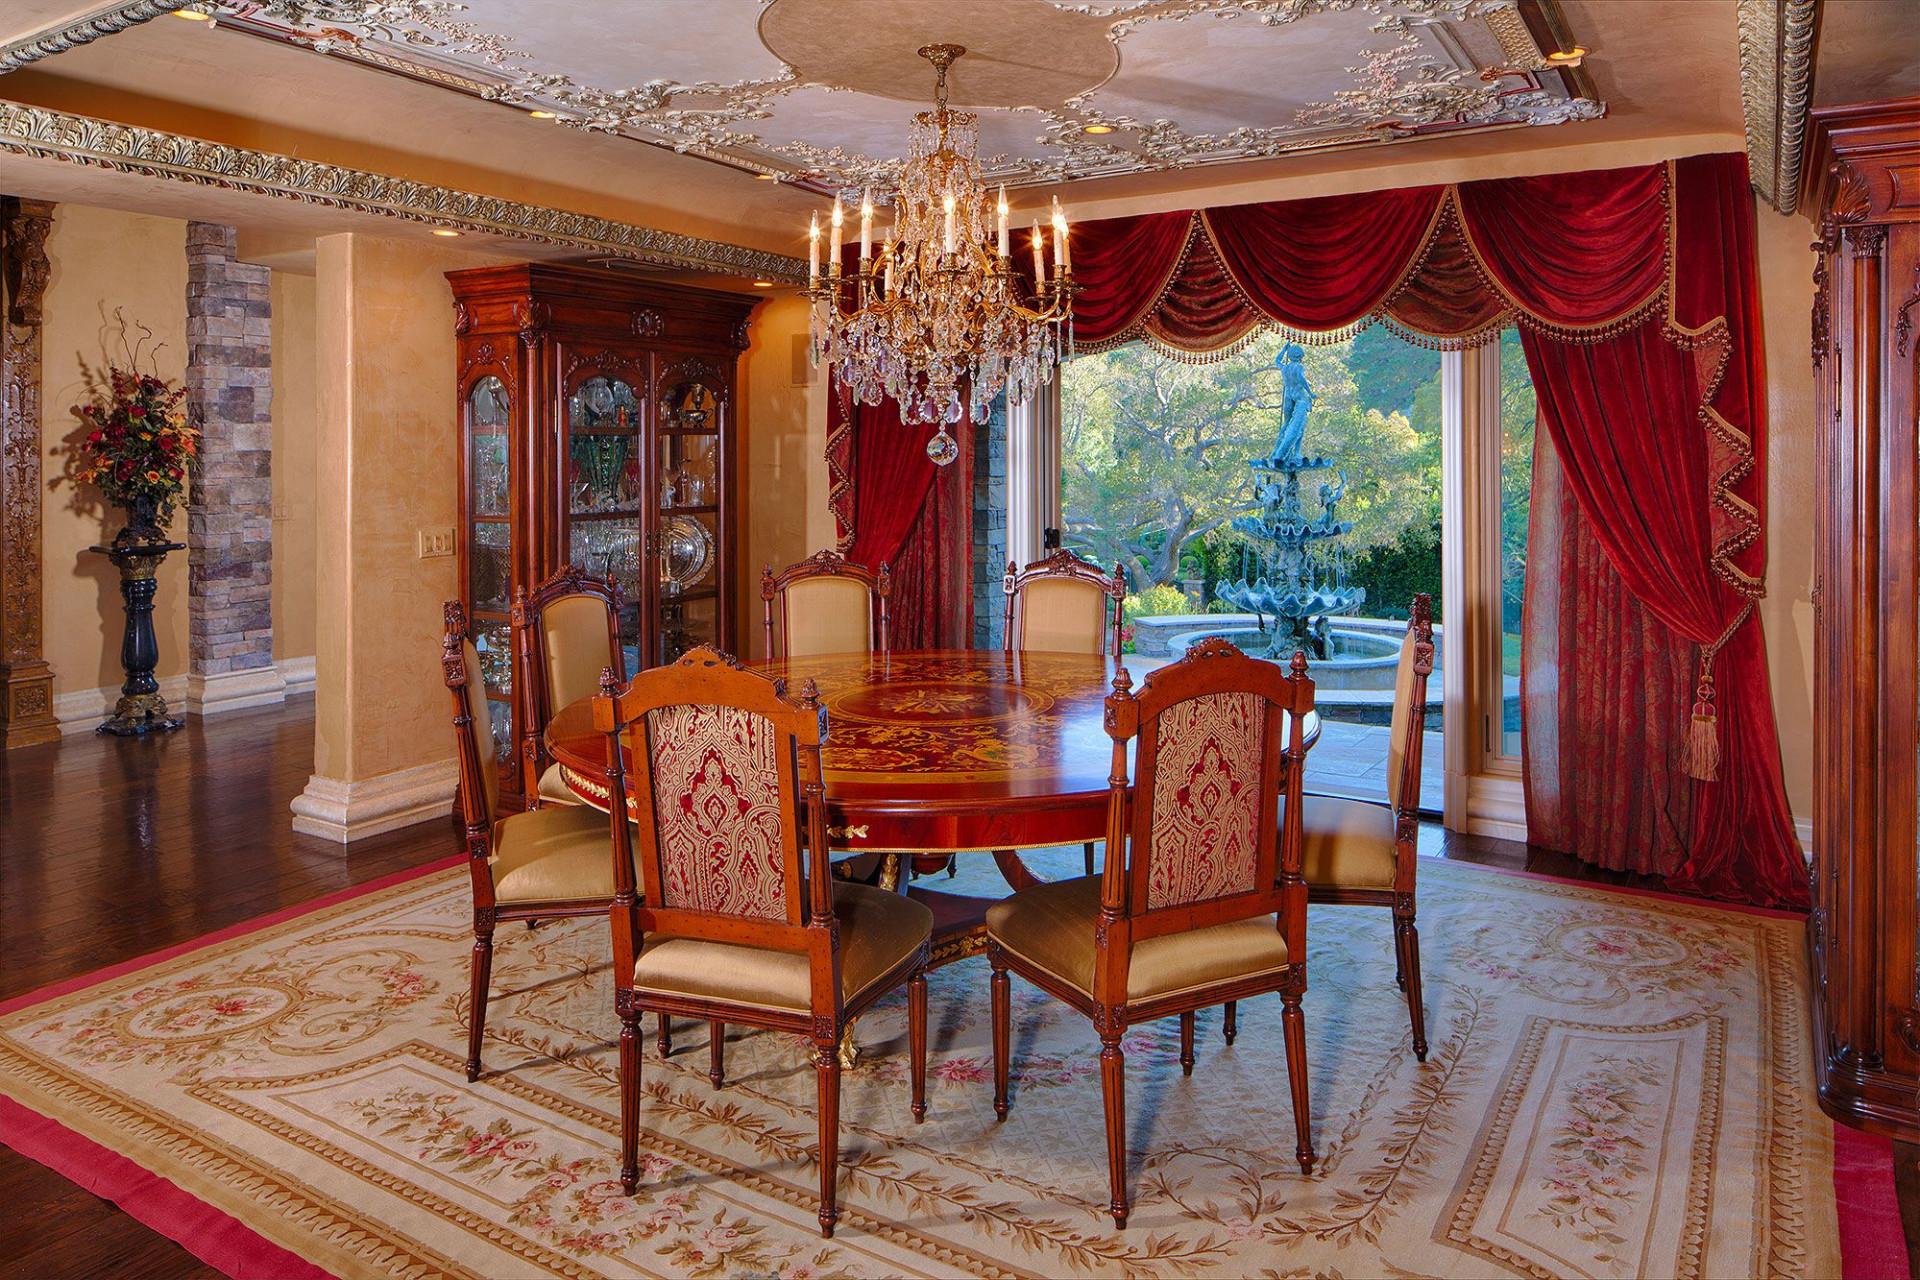 Vendida casa vista nos primeiros episódios do reality show das Kardashian